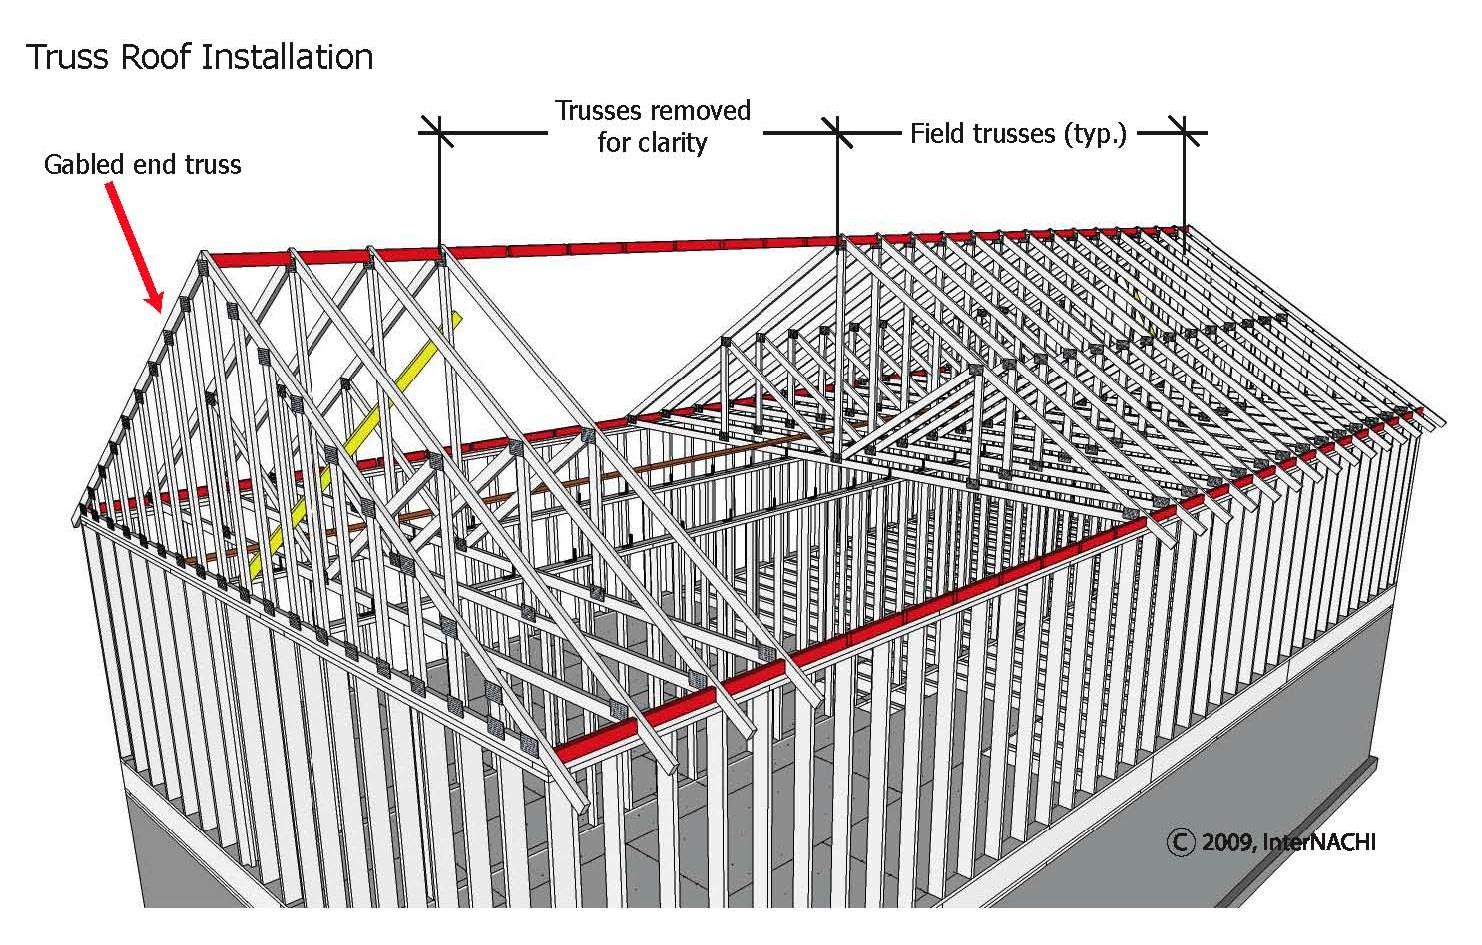 Truss roof installation.